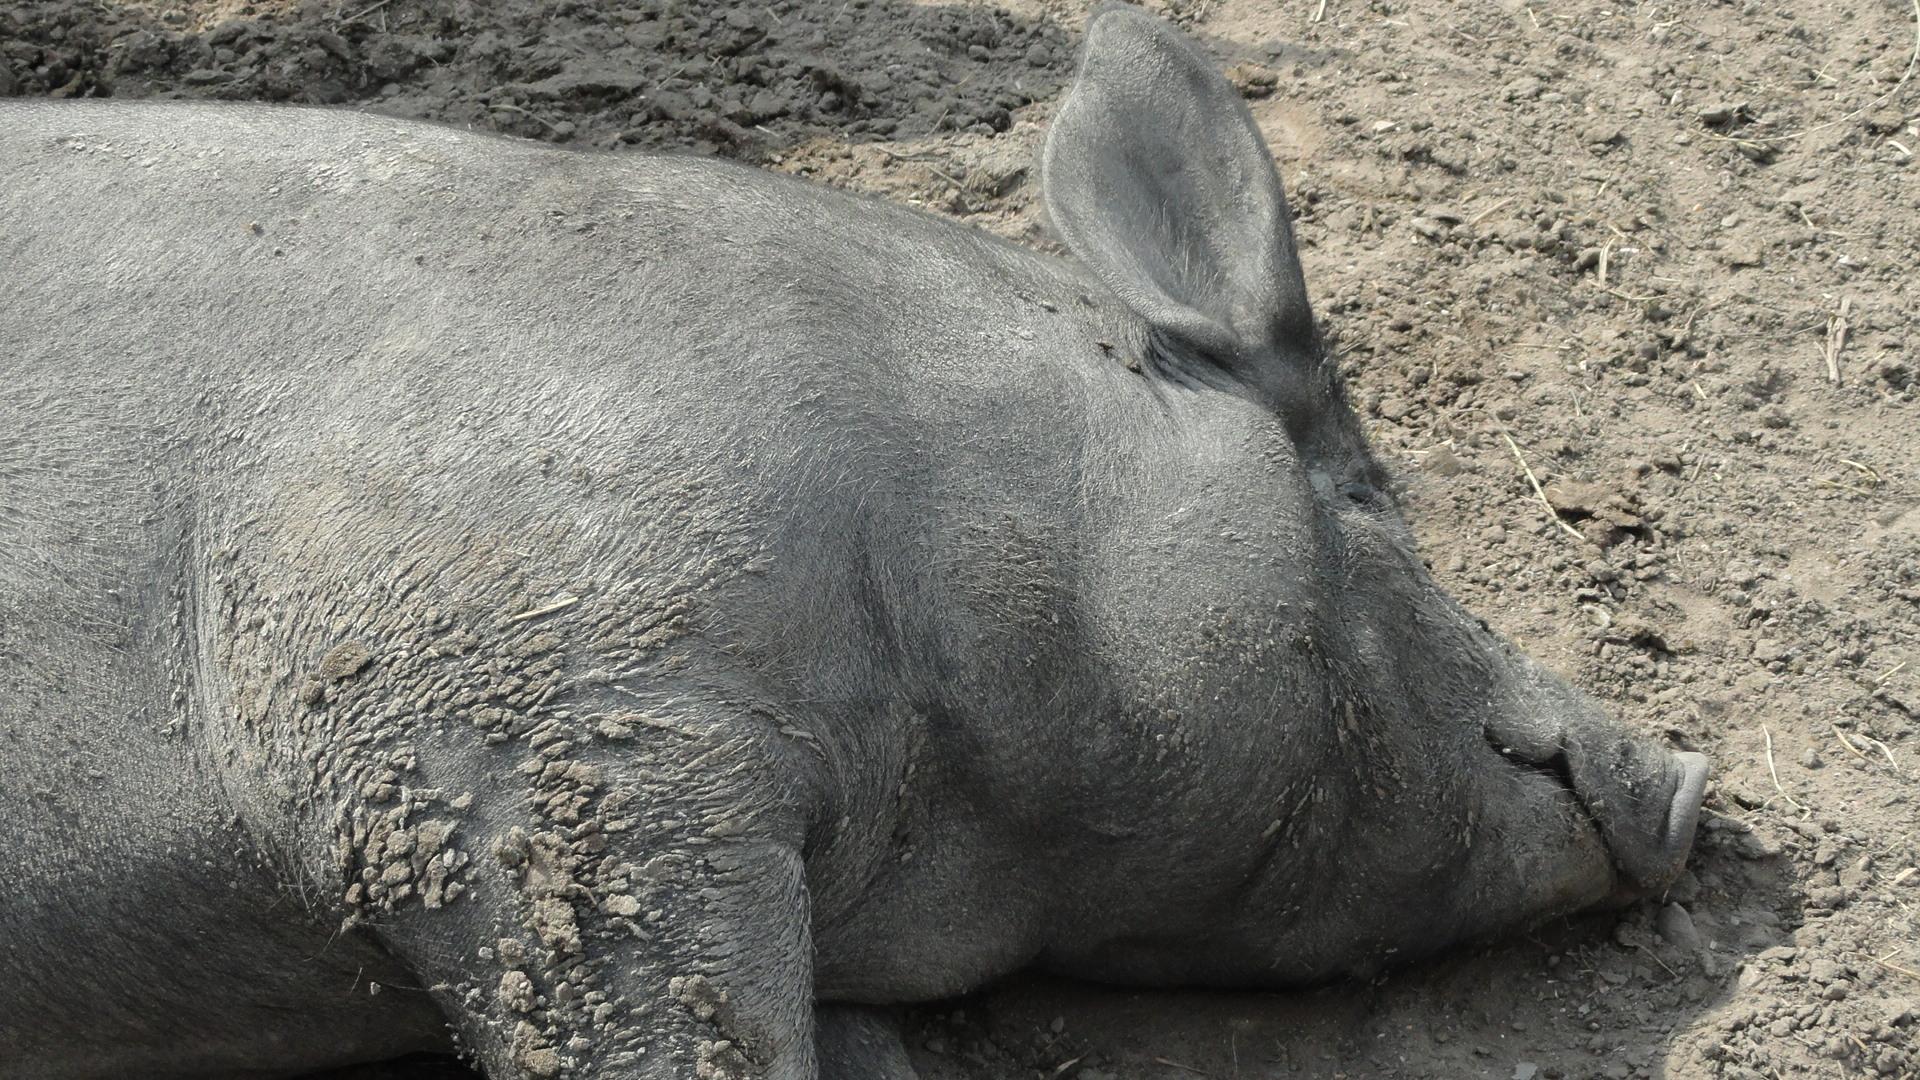 Amsterdamse Bos - Un cochon heureux